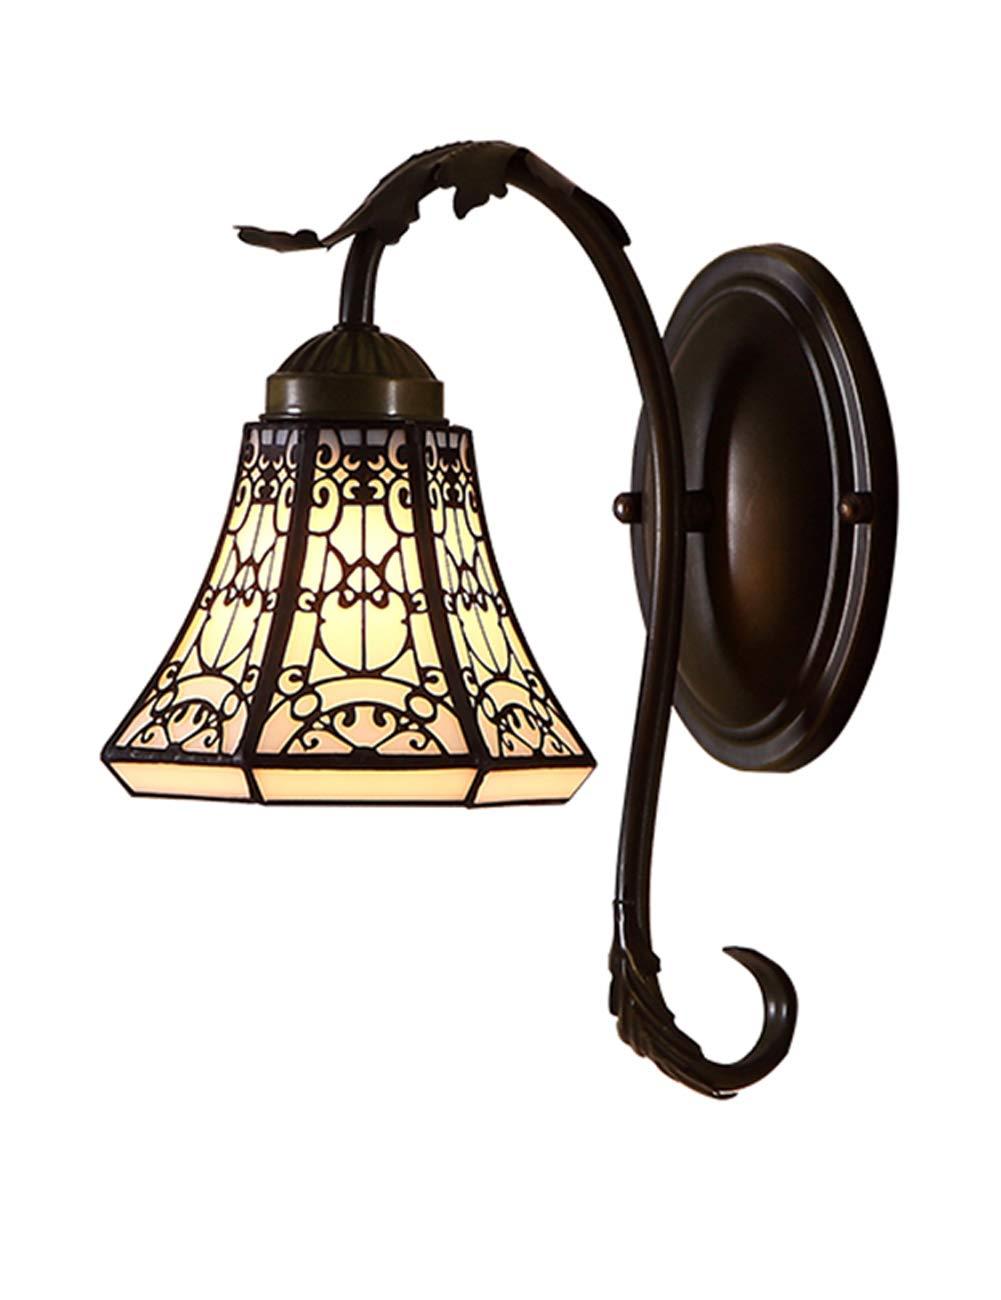 DLyng 自然光を保護する寝室のための小さな壁ランプブラックベースのヴィンテージパターン B07KWY7XNY